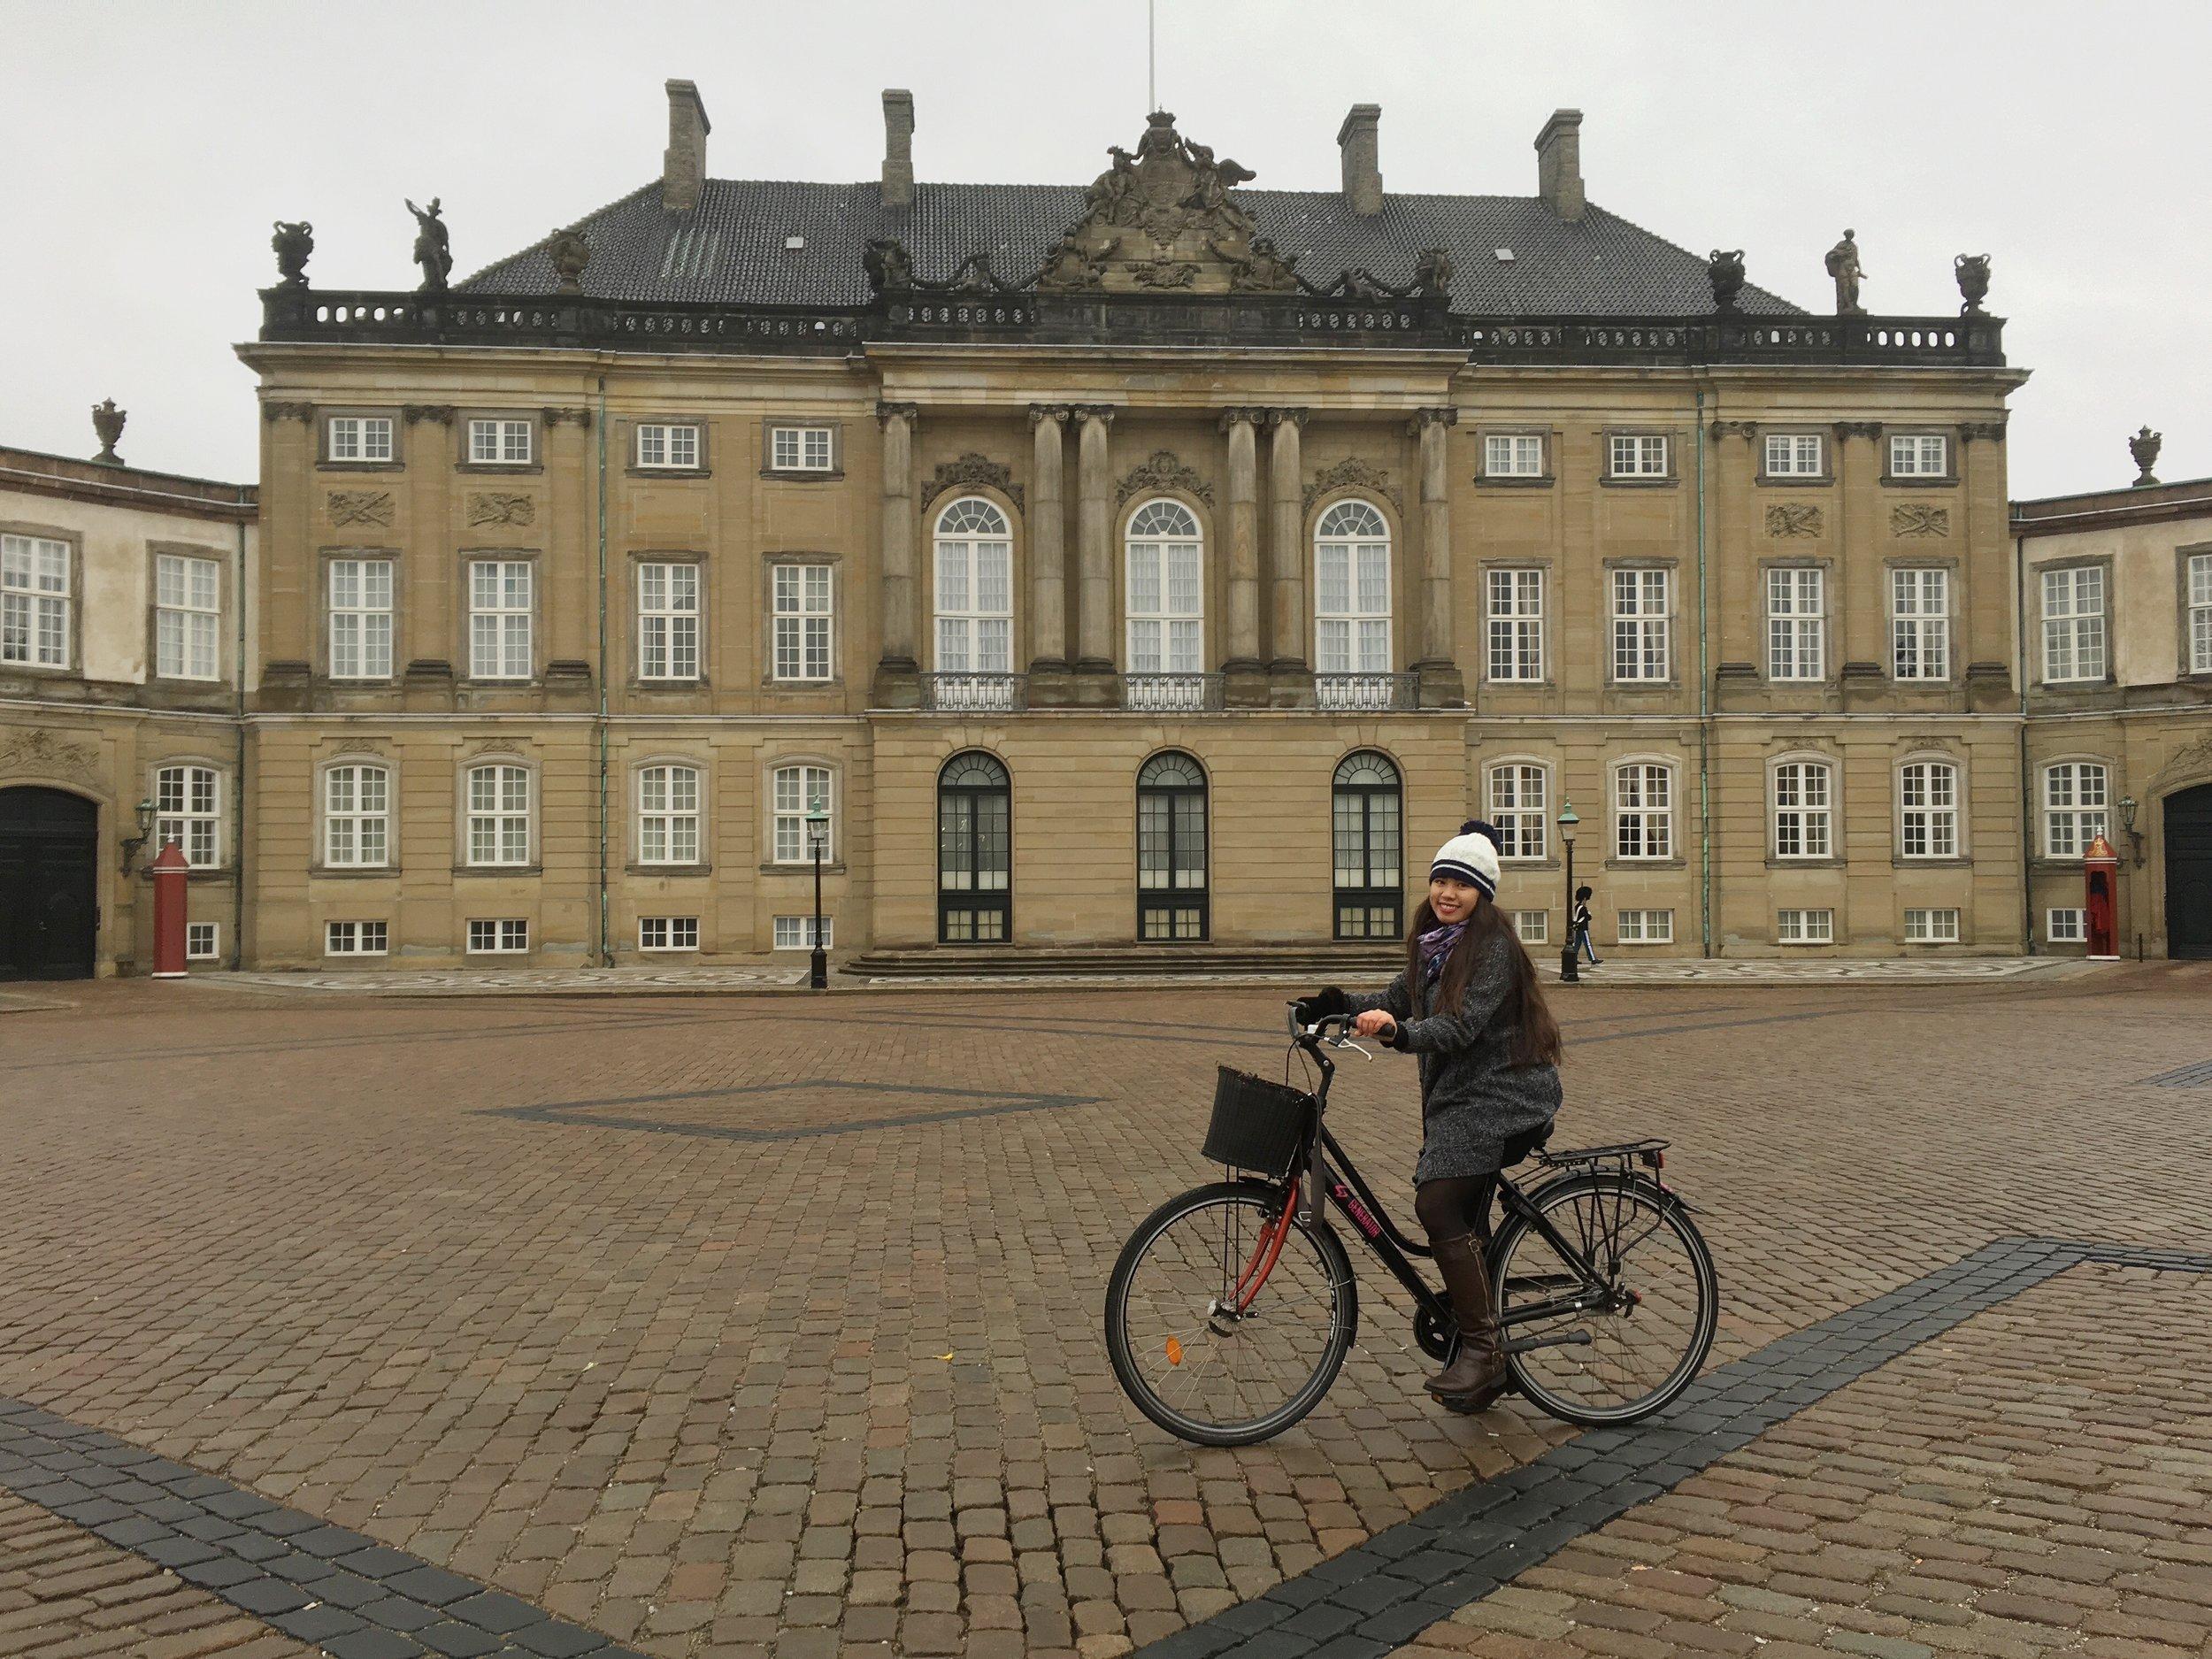 Copenhagen, Denmark –scored a 54 euro RT flight to my first solo destination (thanks to Skyscanner!)